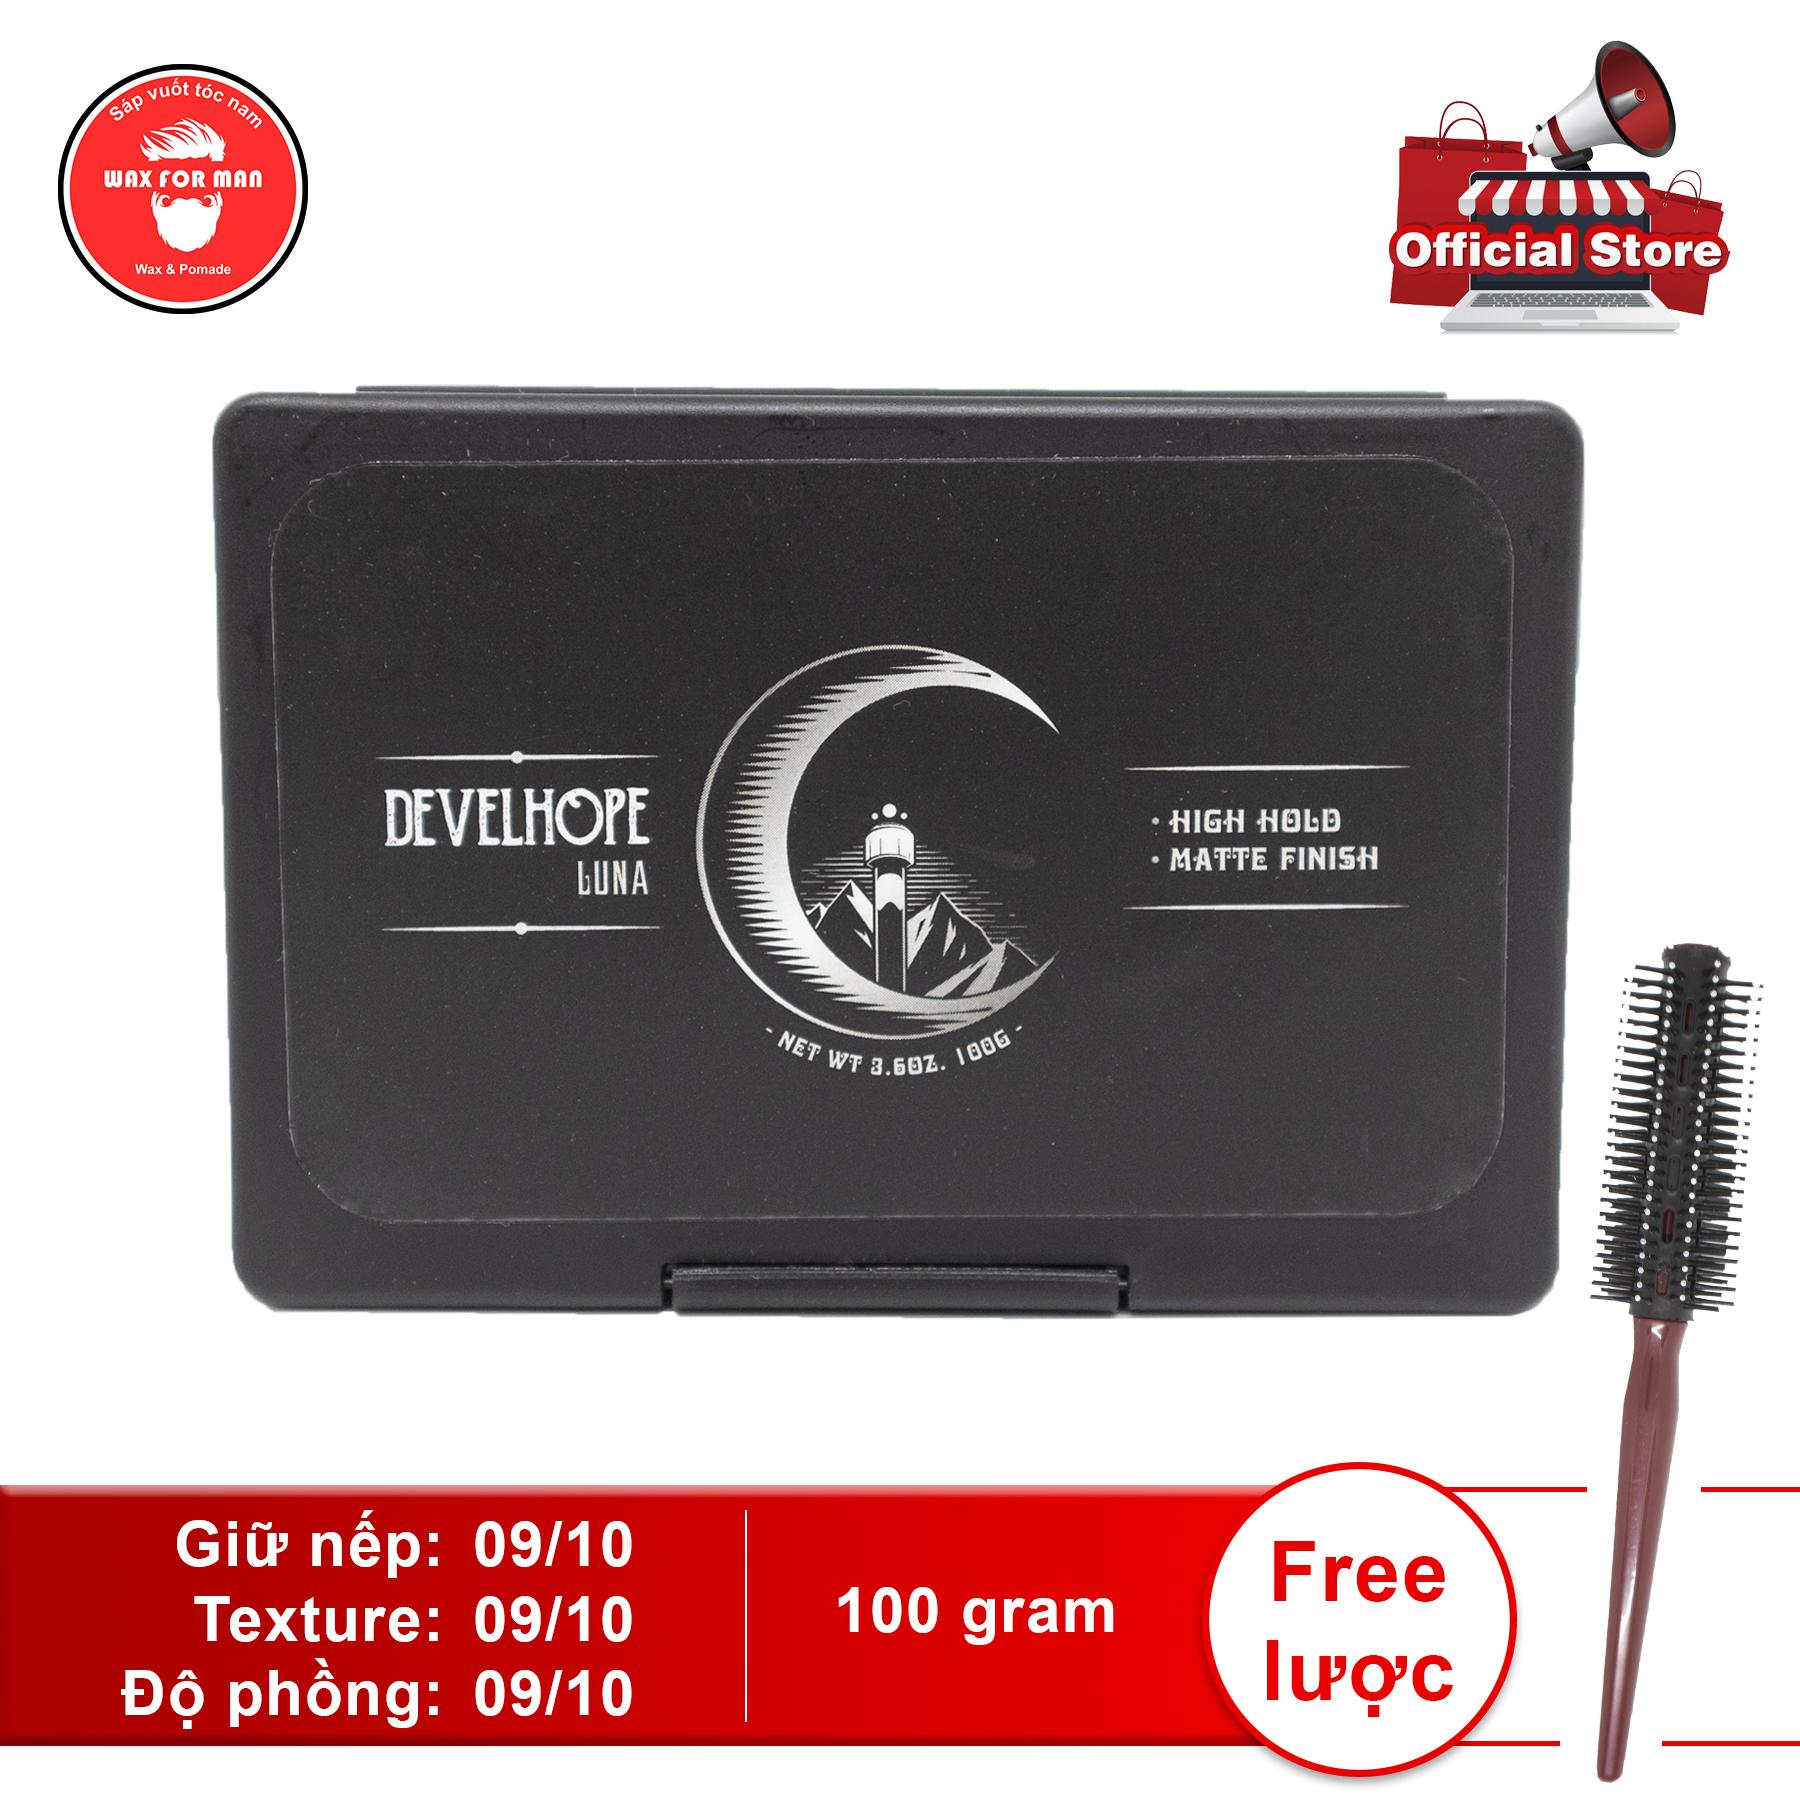 [Tặng lược] Sáp vuốt tóc Develhope Luna version 3 100 gram